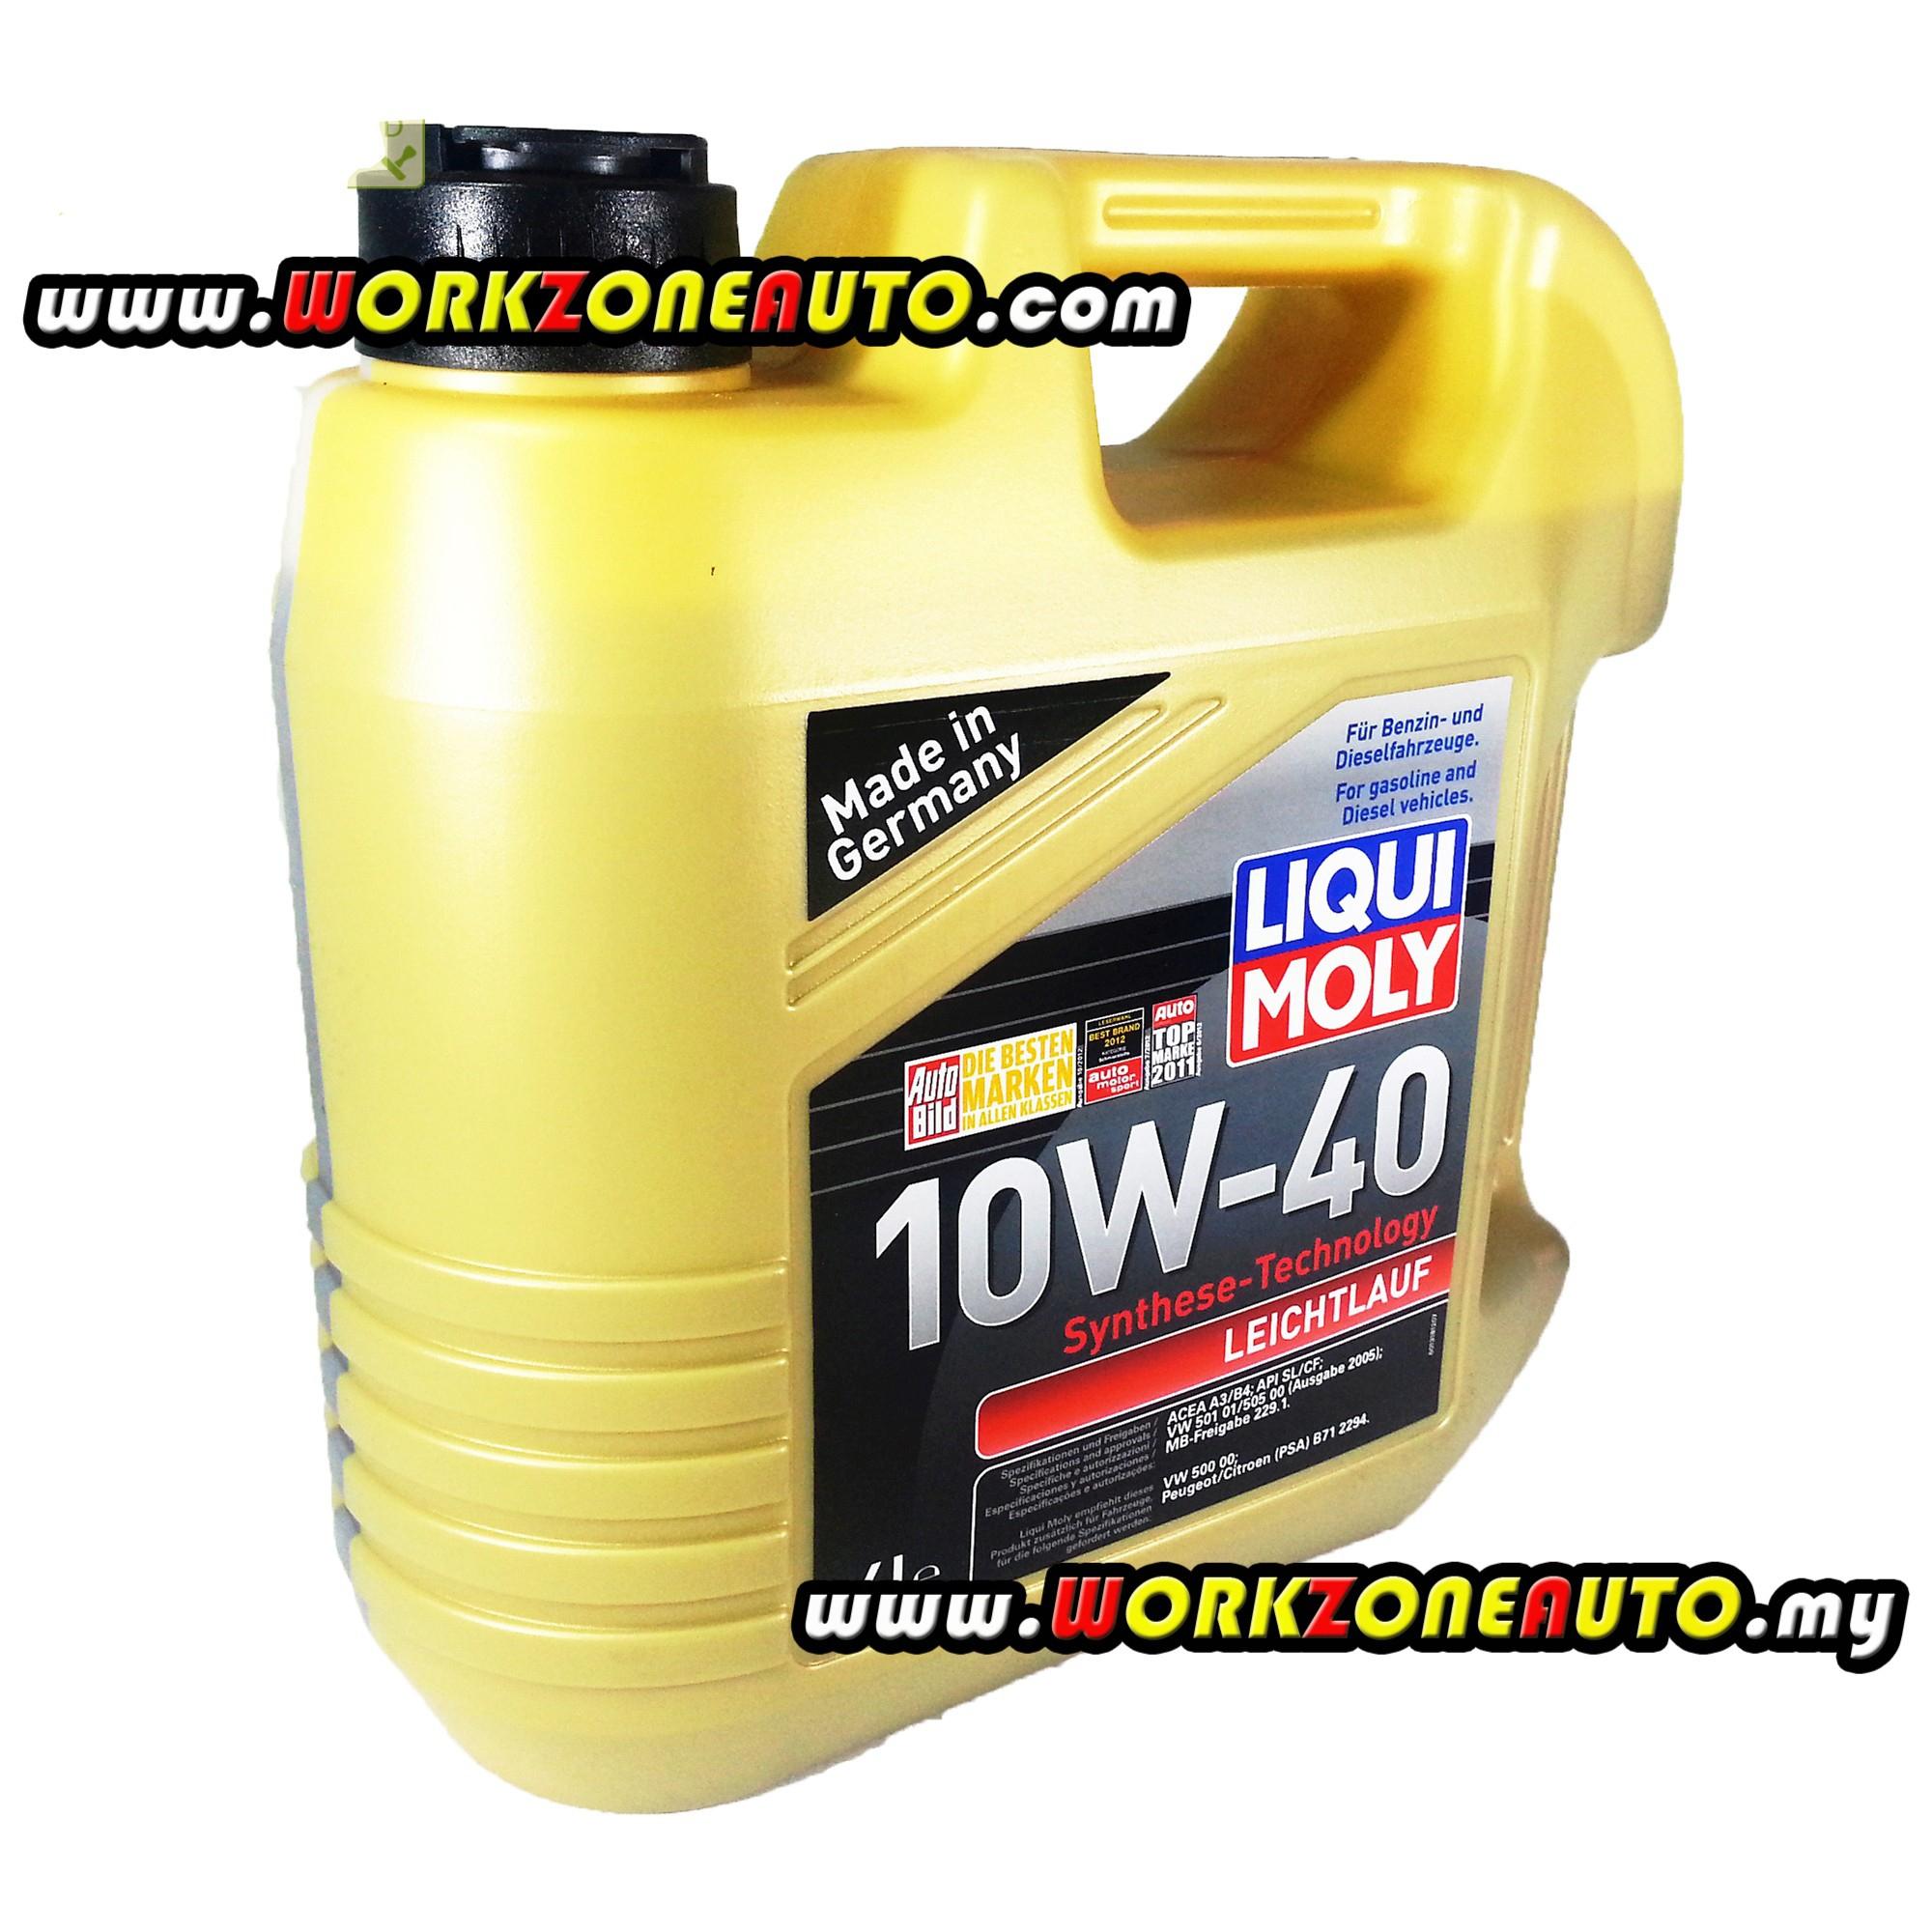 Liqui Moly Leichtlauf 10W40 Mineral Engine Oil 4L